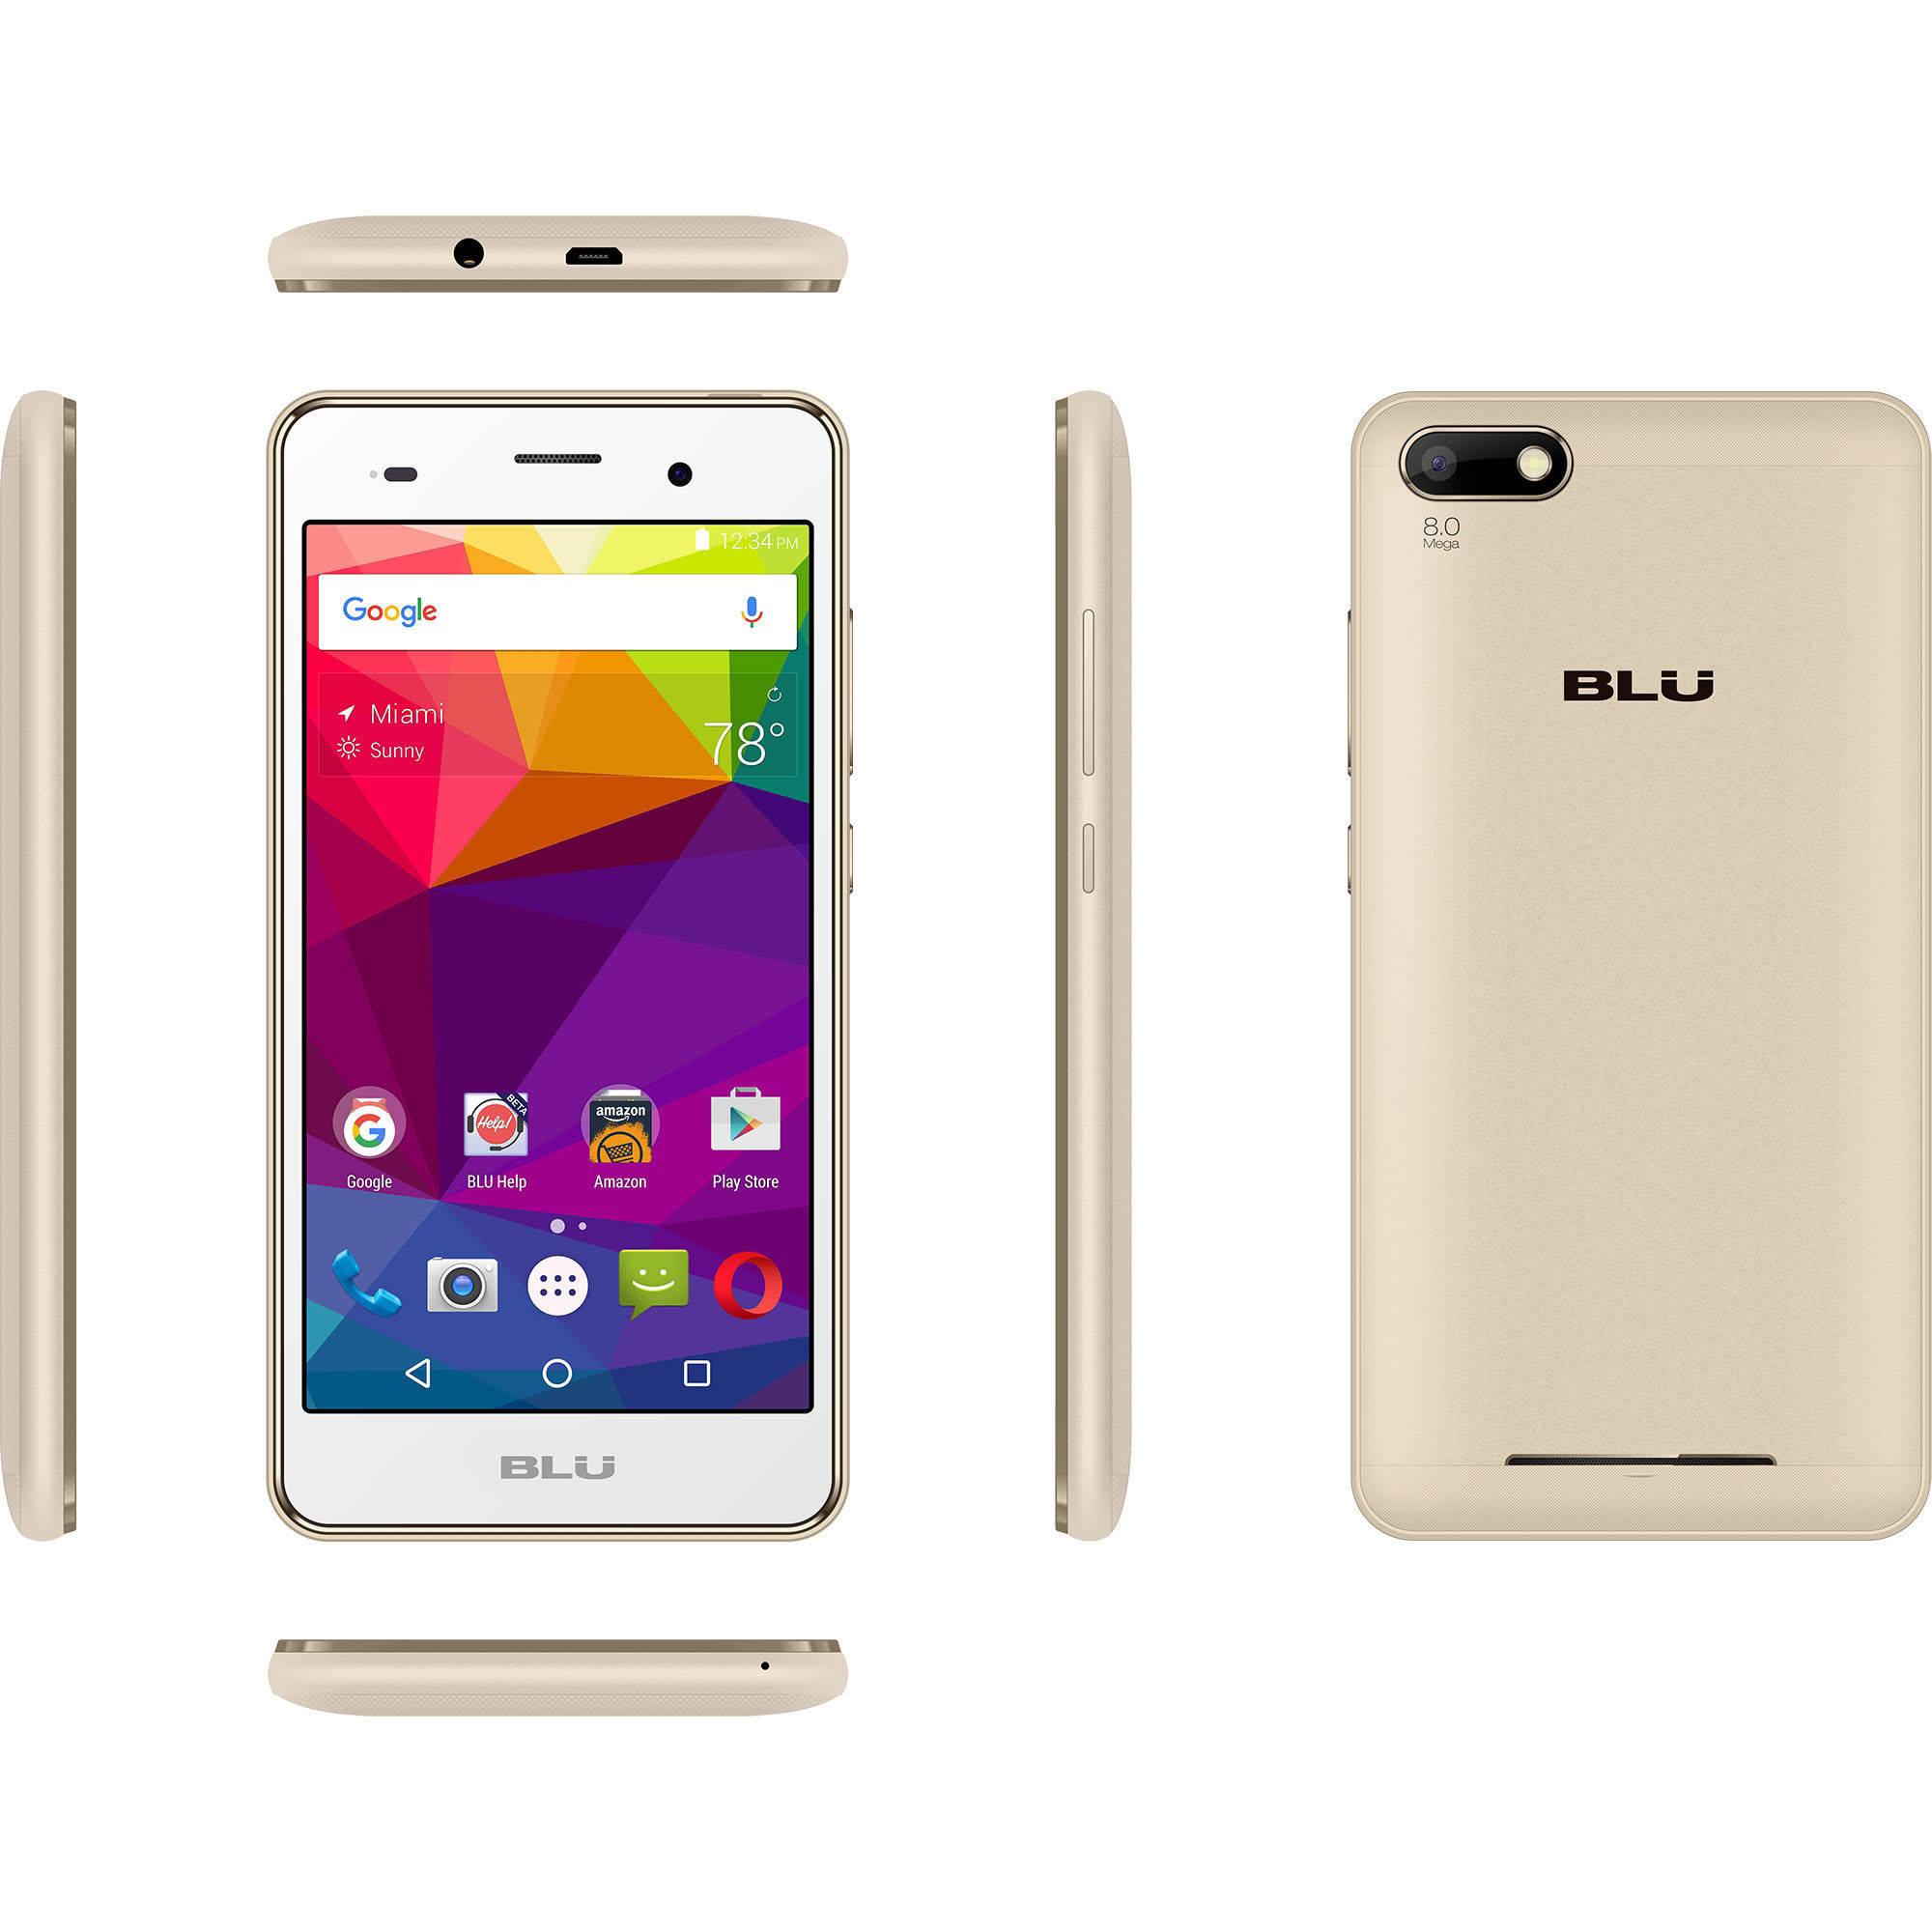 Celular BLU Dash X2 D110U GSM Smartphone (desbloqueado), oro + BLU en VeoyCompro.com.co